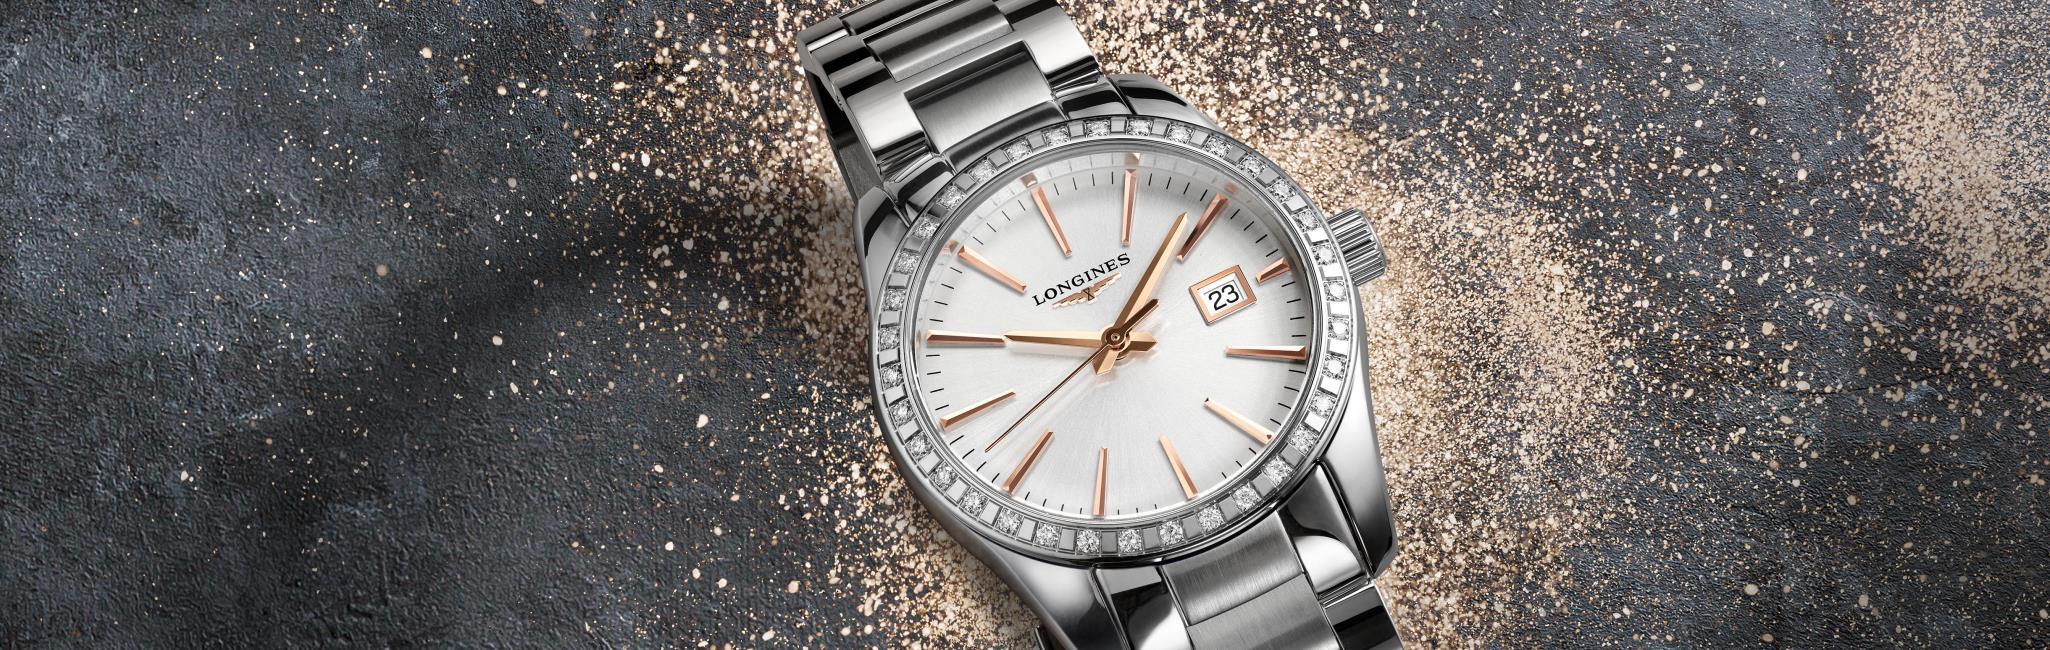 Longines Uhren Online Shop